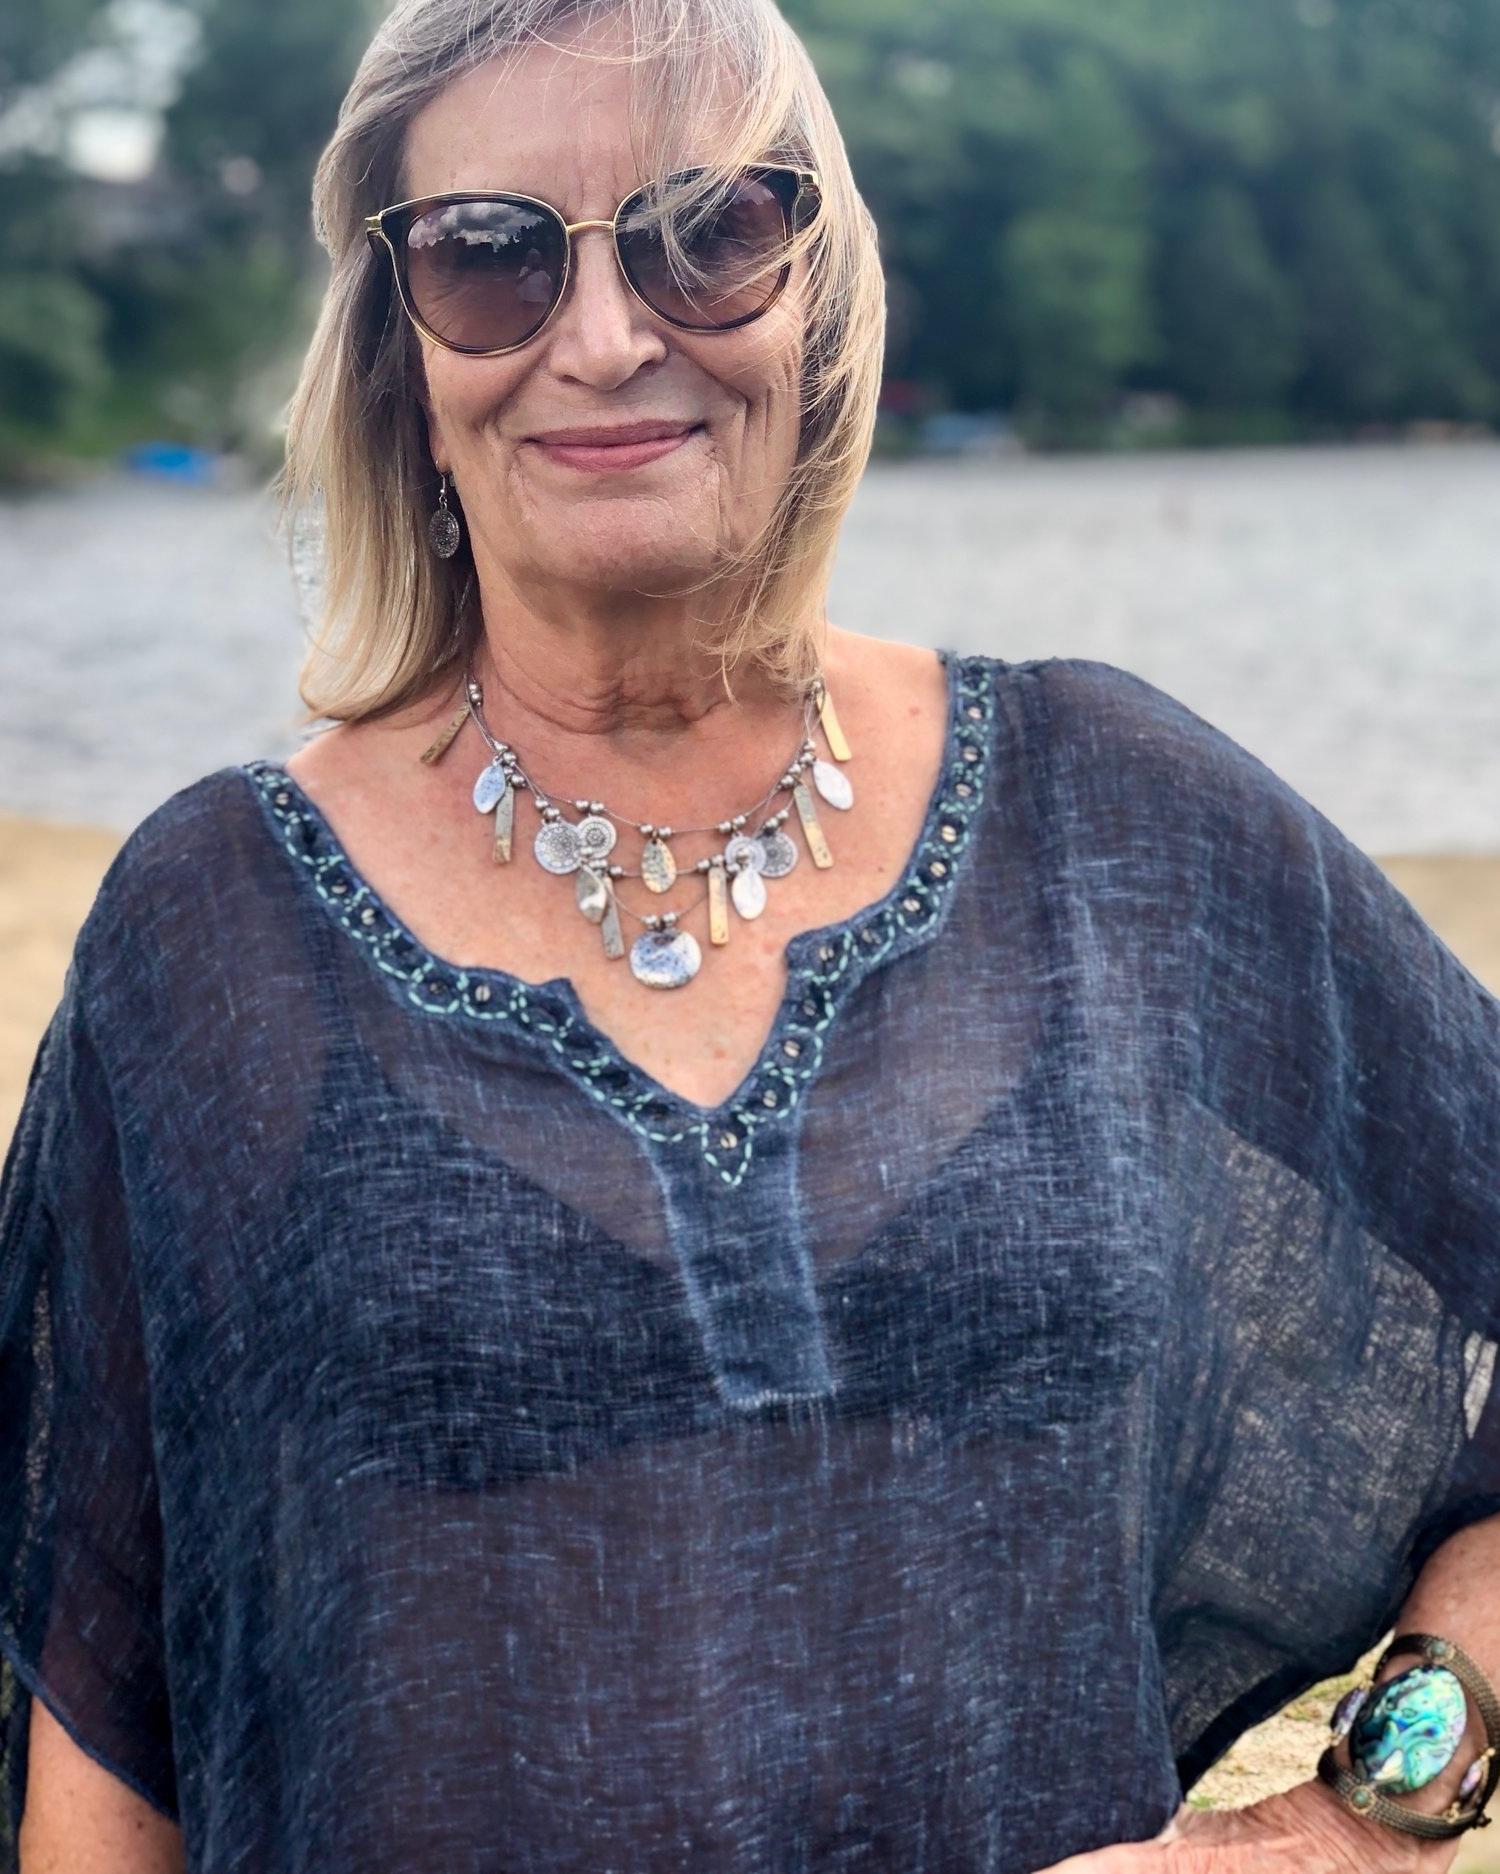 cover up Dolma bracelet Jan Michaels necklace Sadie Green.jpeg